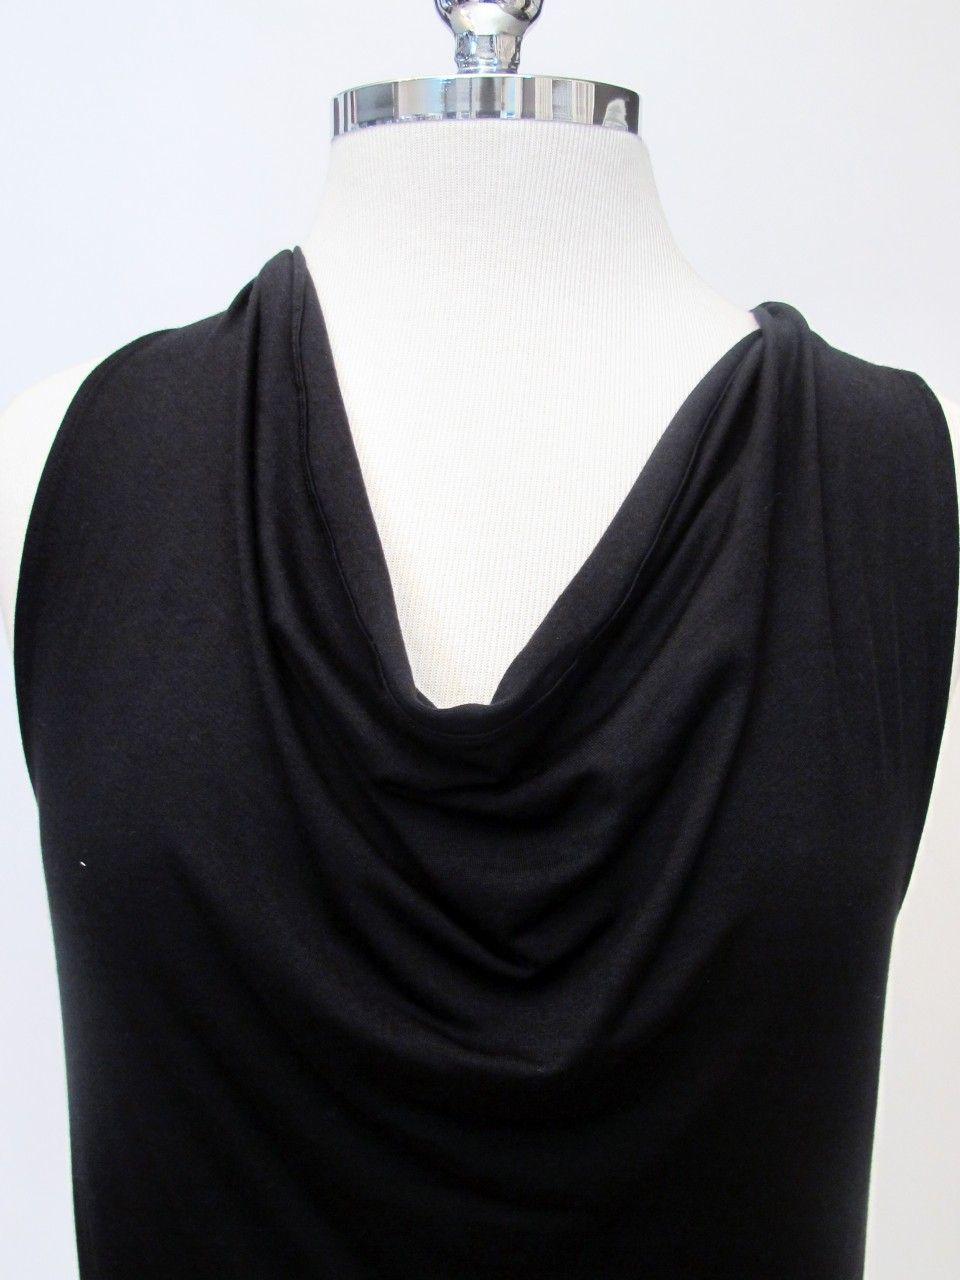 Azura Boutique - Feel the Piece Cowl Tank in Black, $99.00 (http://www.shopazura.com/feel-the-piece-cowl-tank-in-black/)